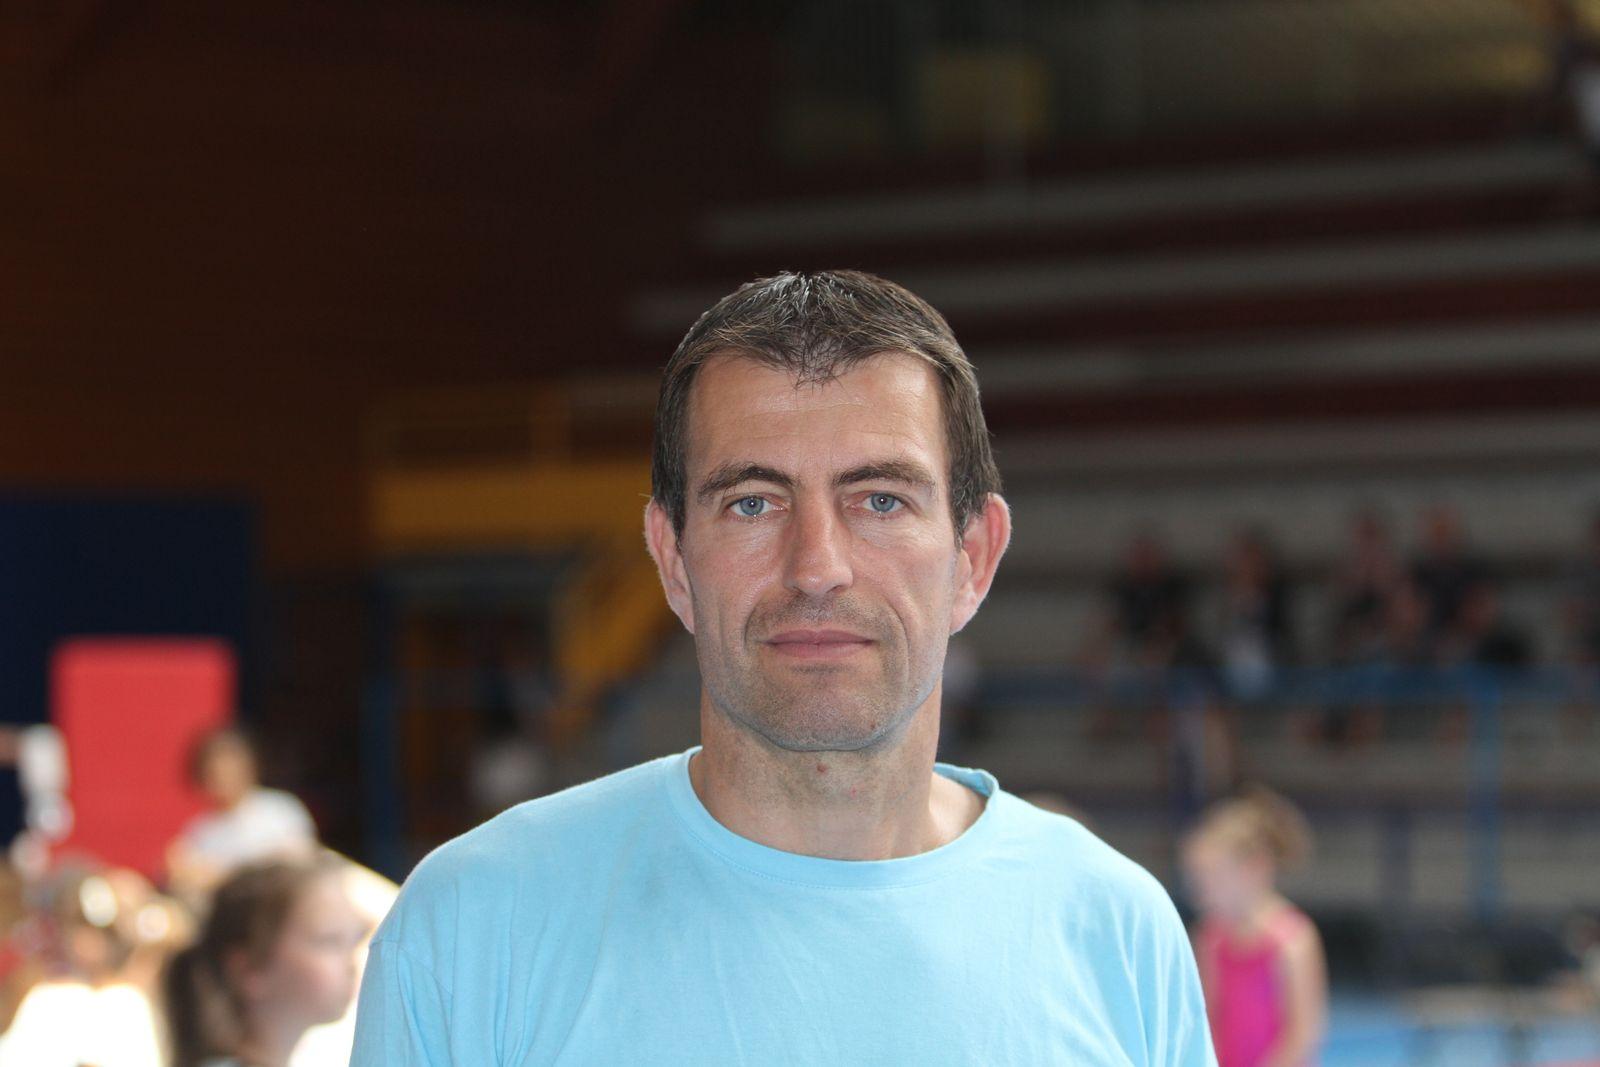 Fabrice Cantaluppi président du CMOV Gymnastique danse et trampoline